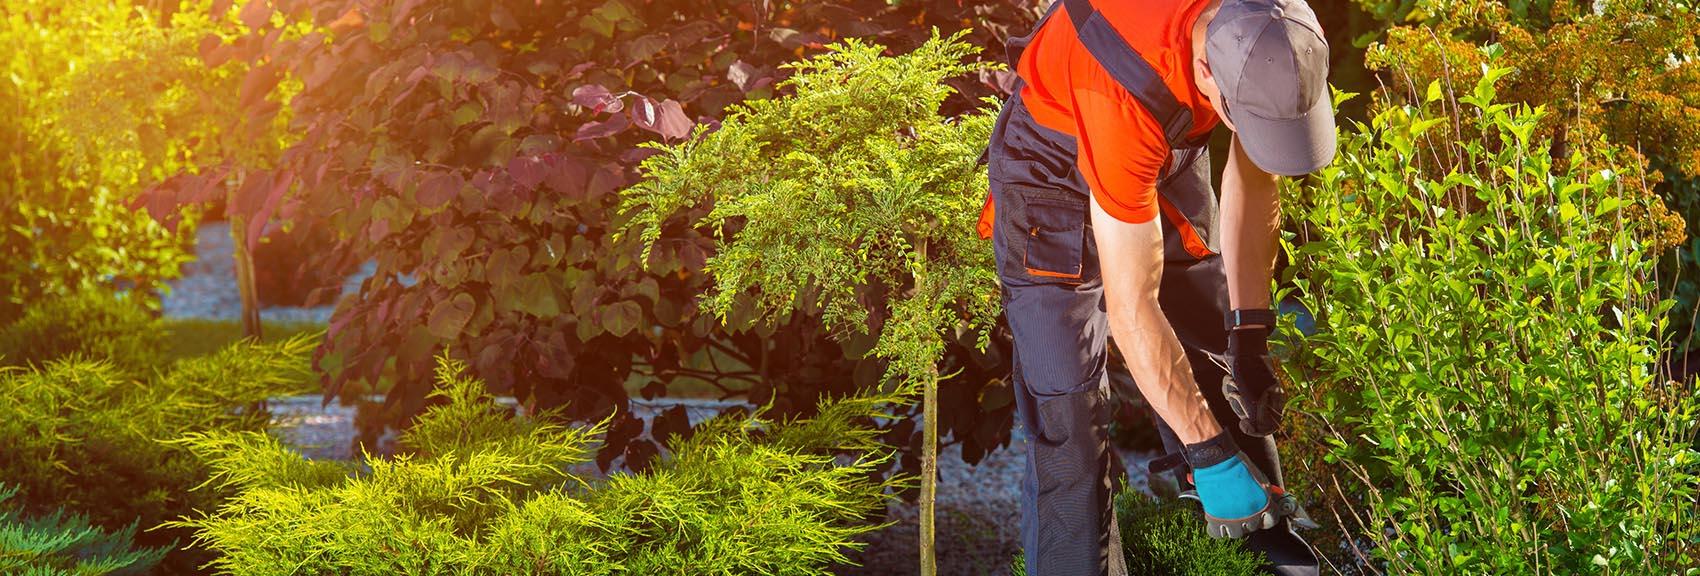 gartenbau preise – jetzt preisvergleich starten » 11880-gartenbau, Garten ideen